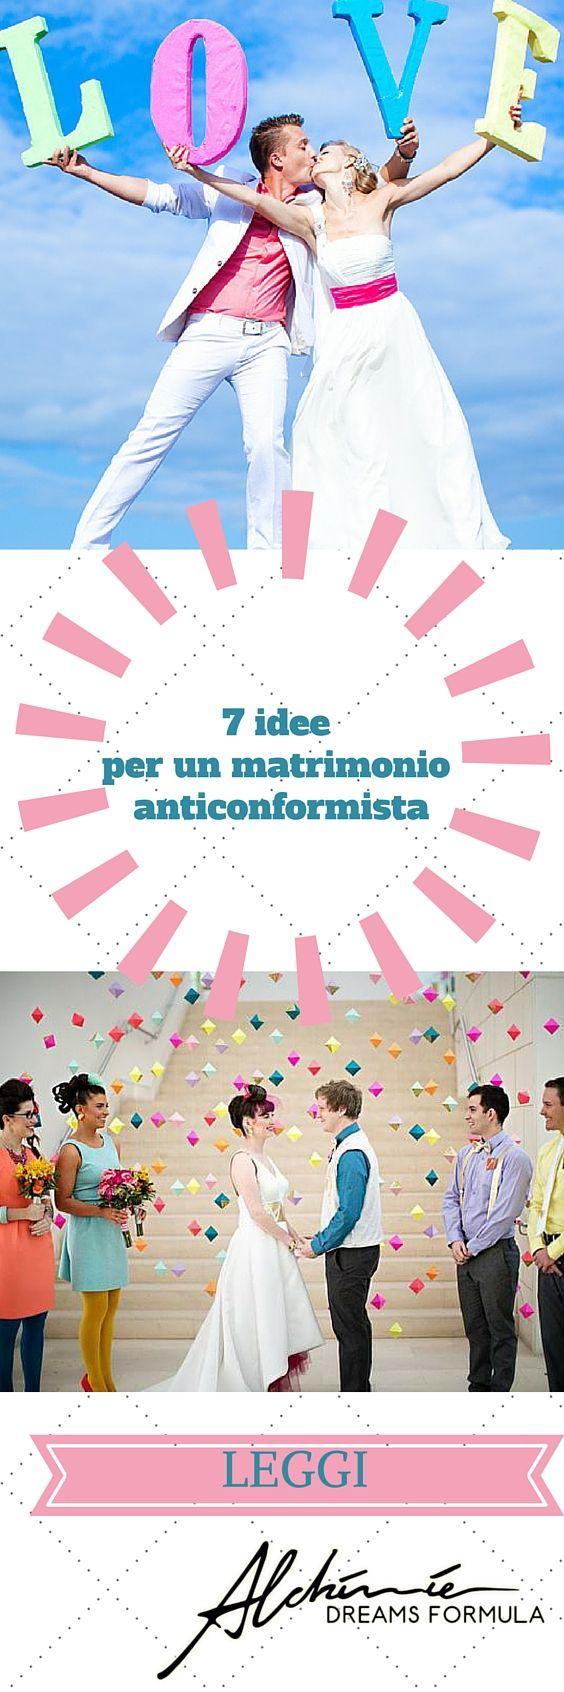 Idee pazze per un matrimonio anticonformista -  Crazy ideas for unconventional wedding